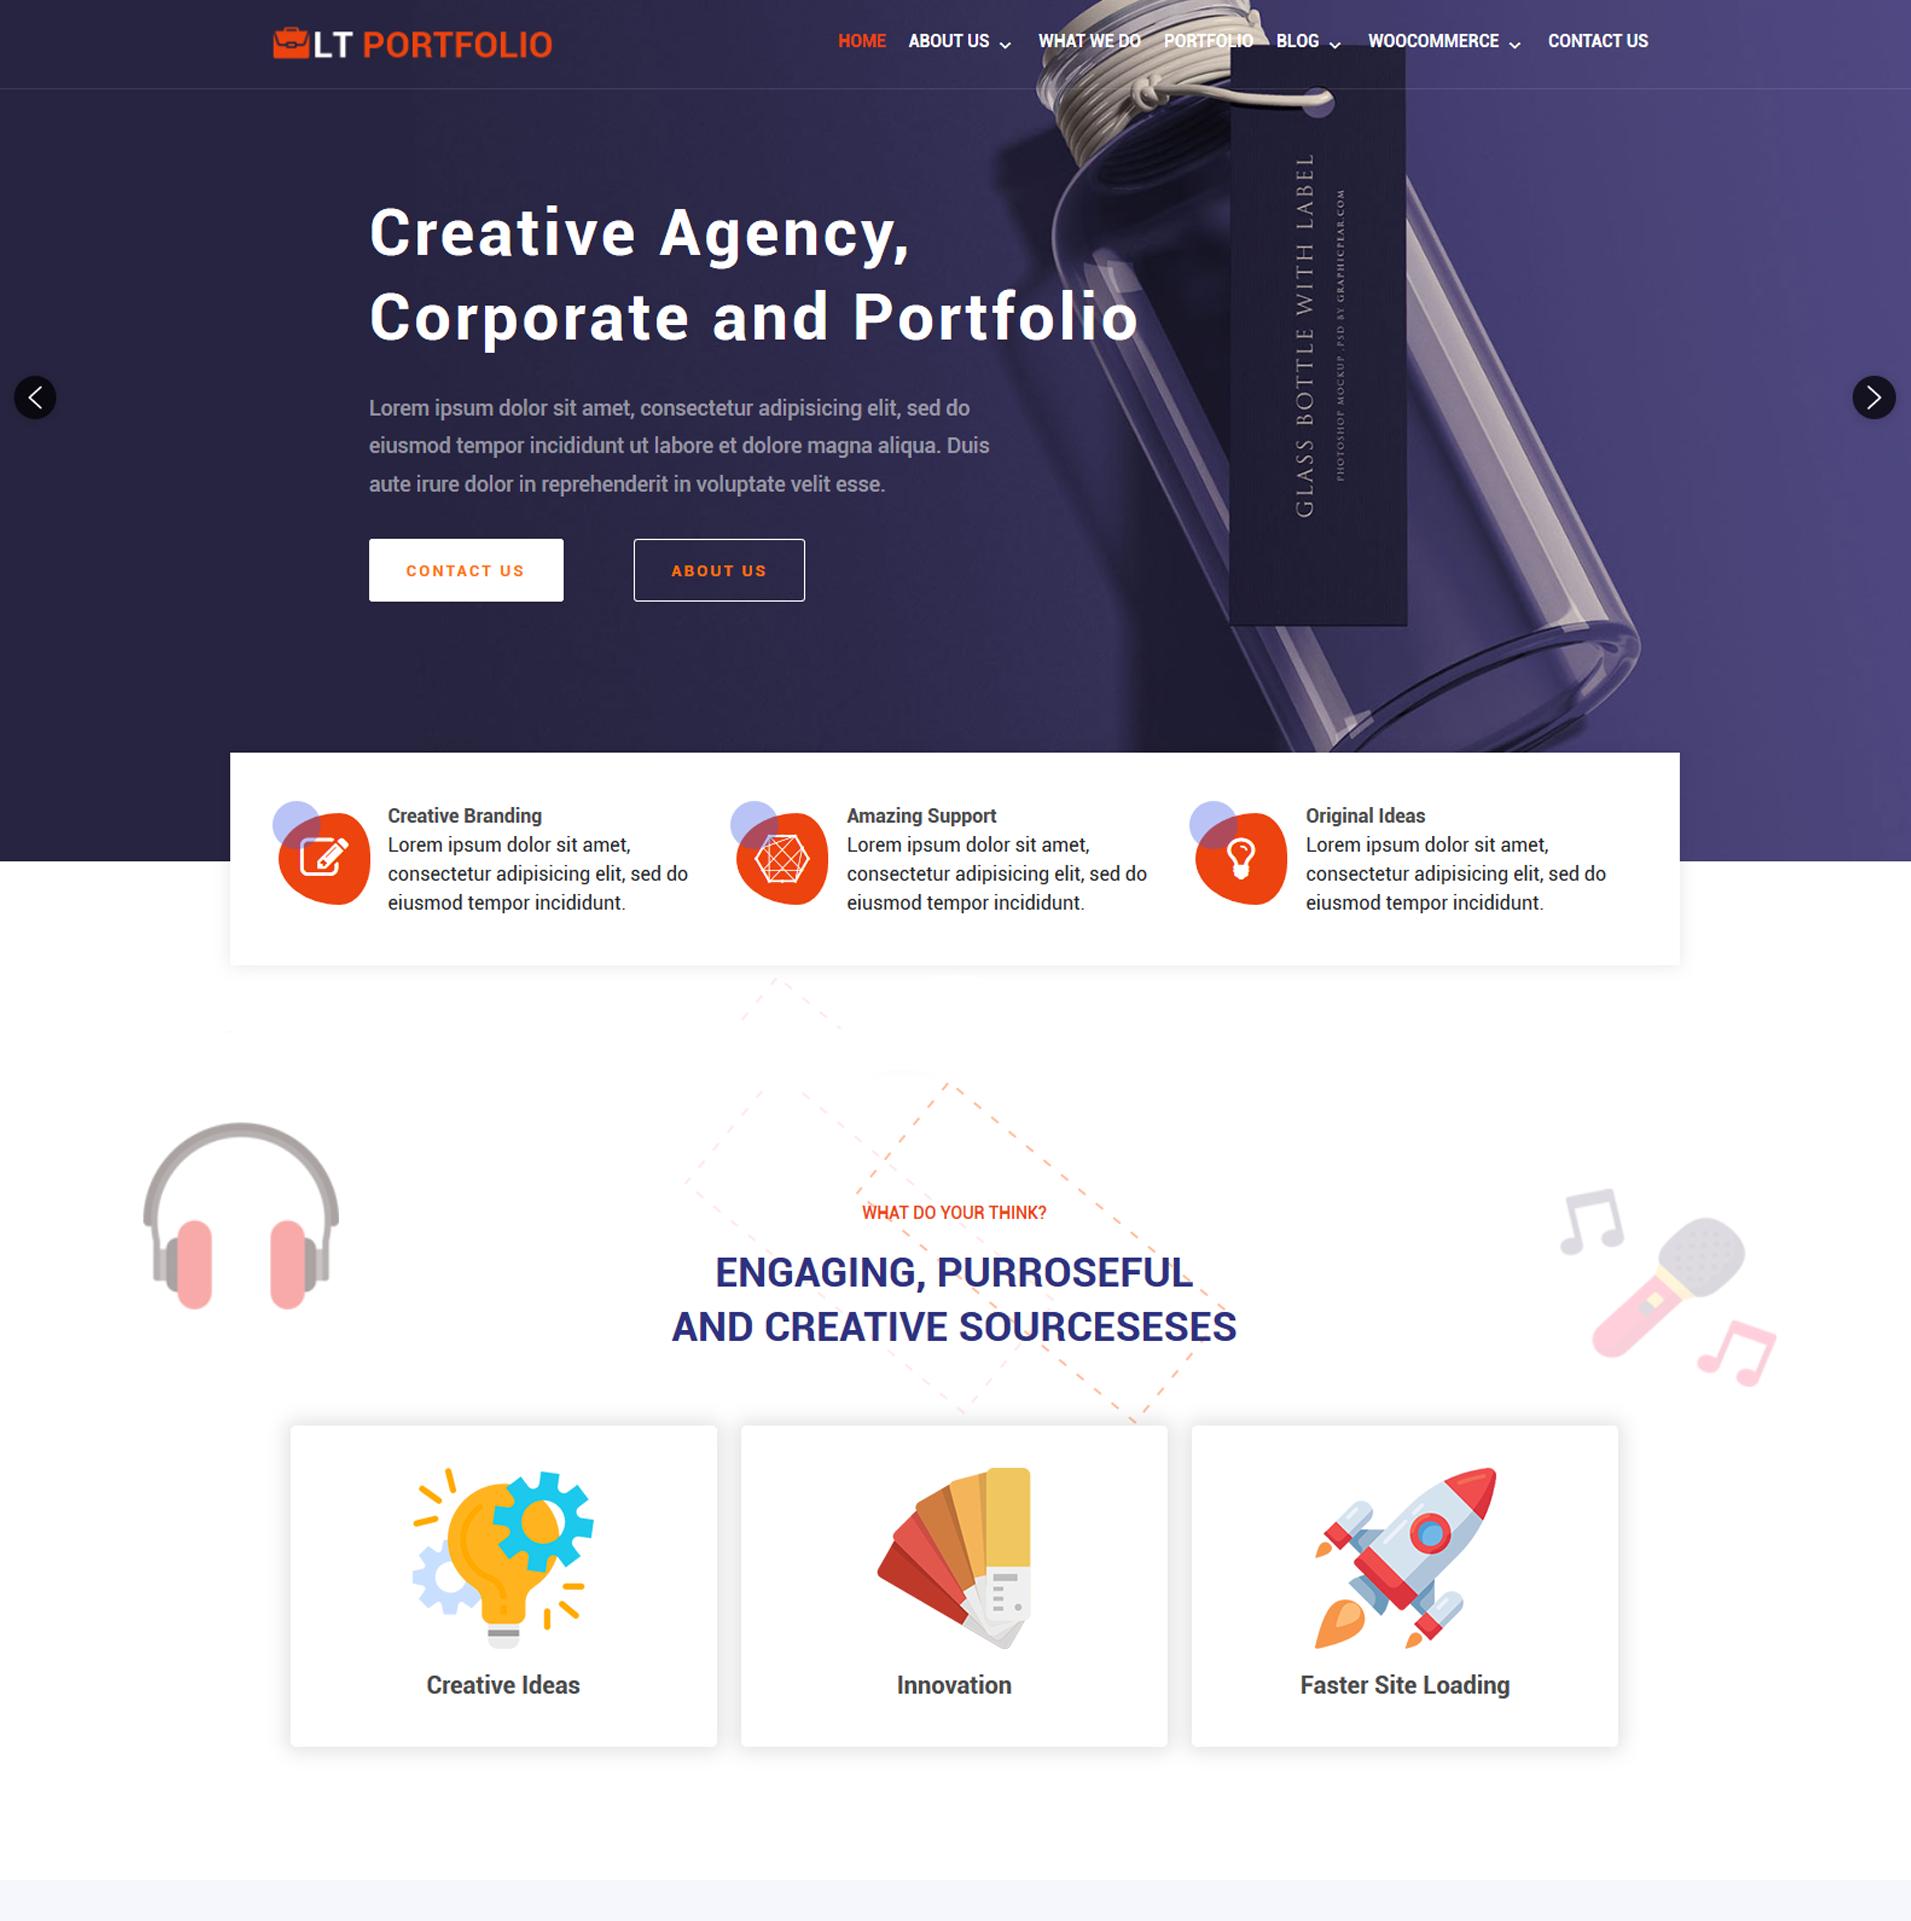 lt-portfolio-free-responsive-worspress-theme